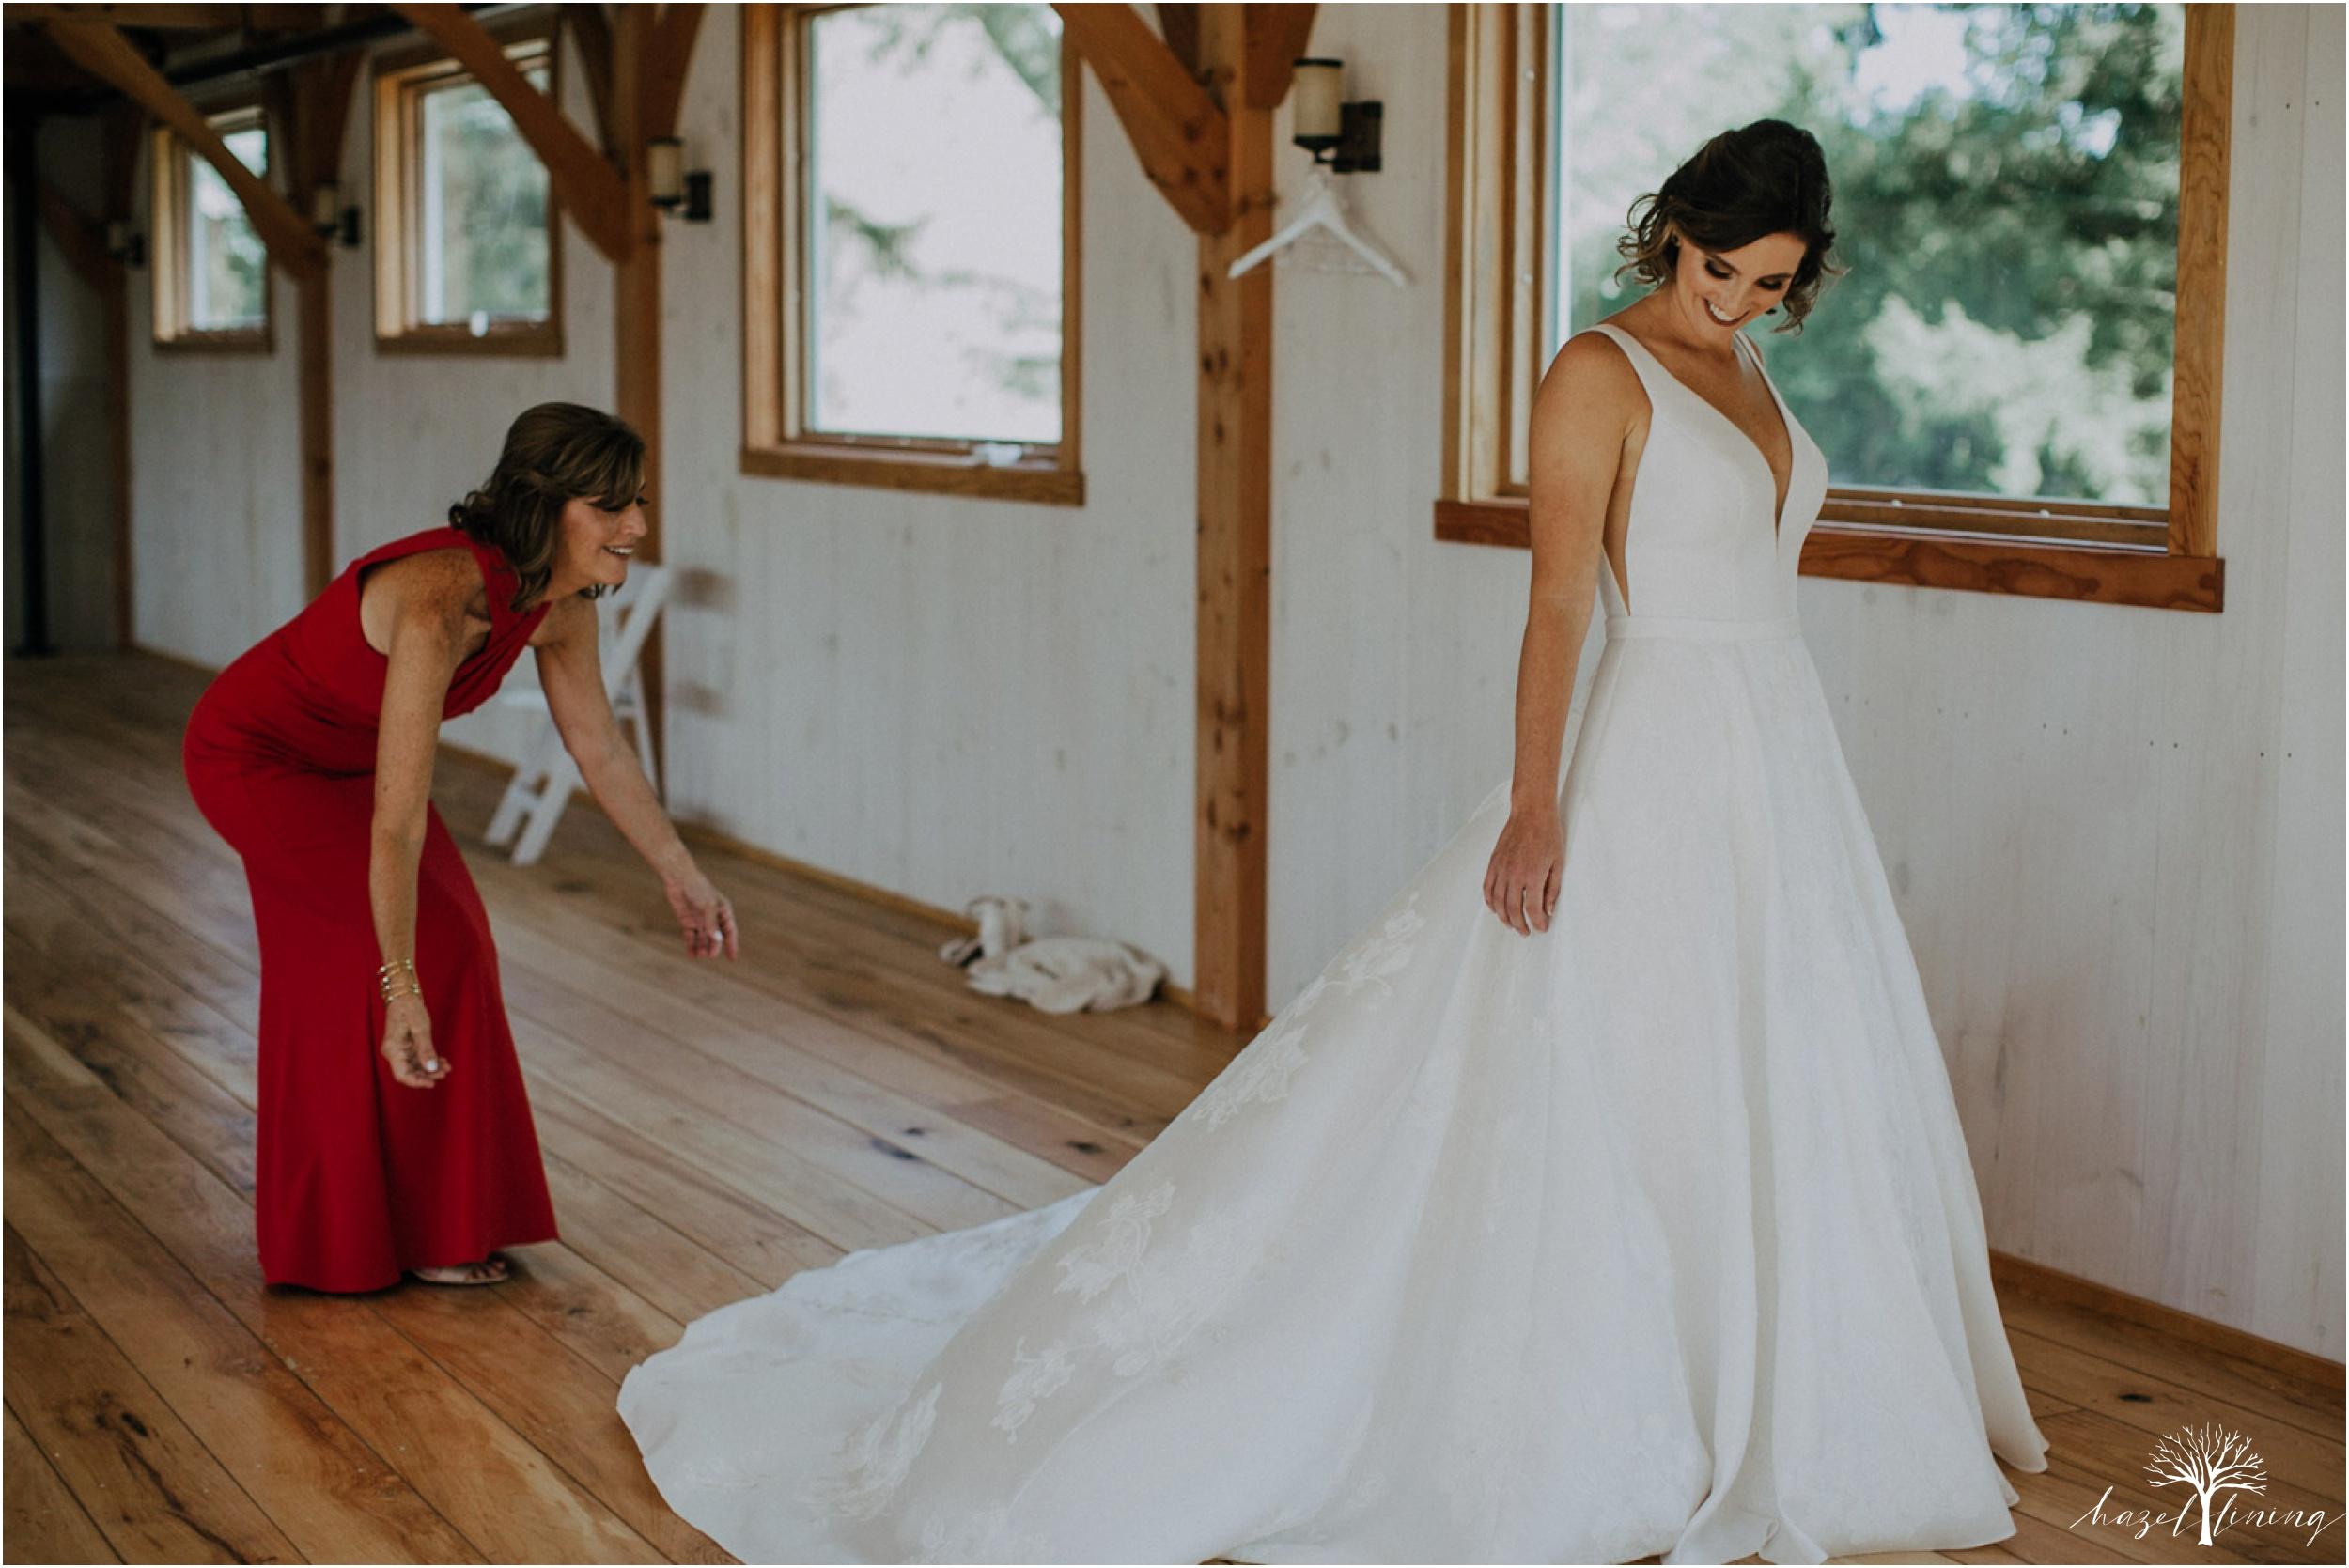 maureen-hepner-anthony-giordano-rose-bank-winery-newtow-pennsylvania-luxury-summer-wedding-hazel-lining-photography-destination-elopement-wedding-engagement-photography_0016.jpg